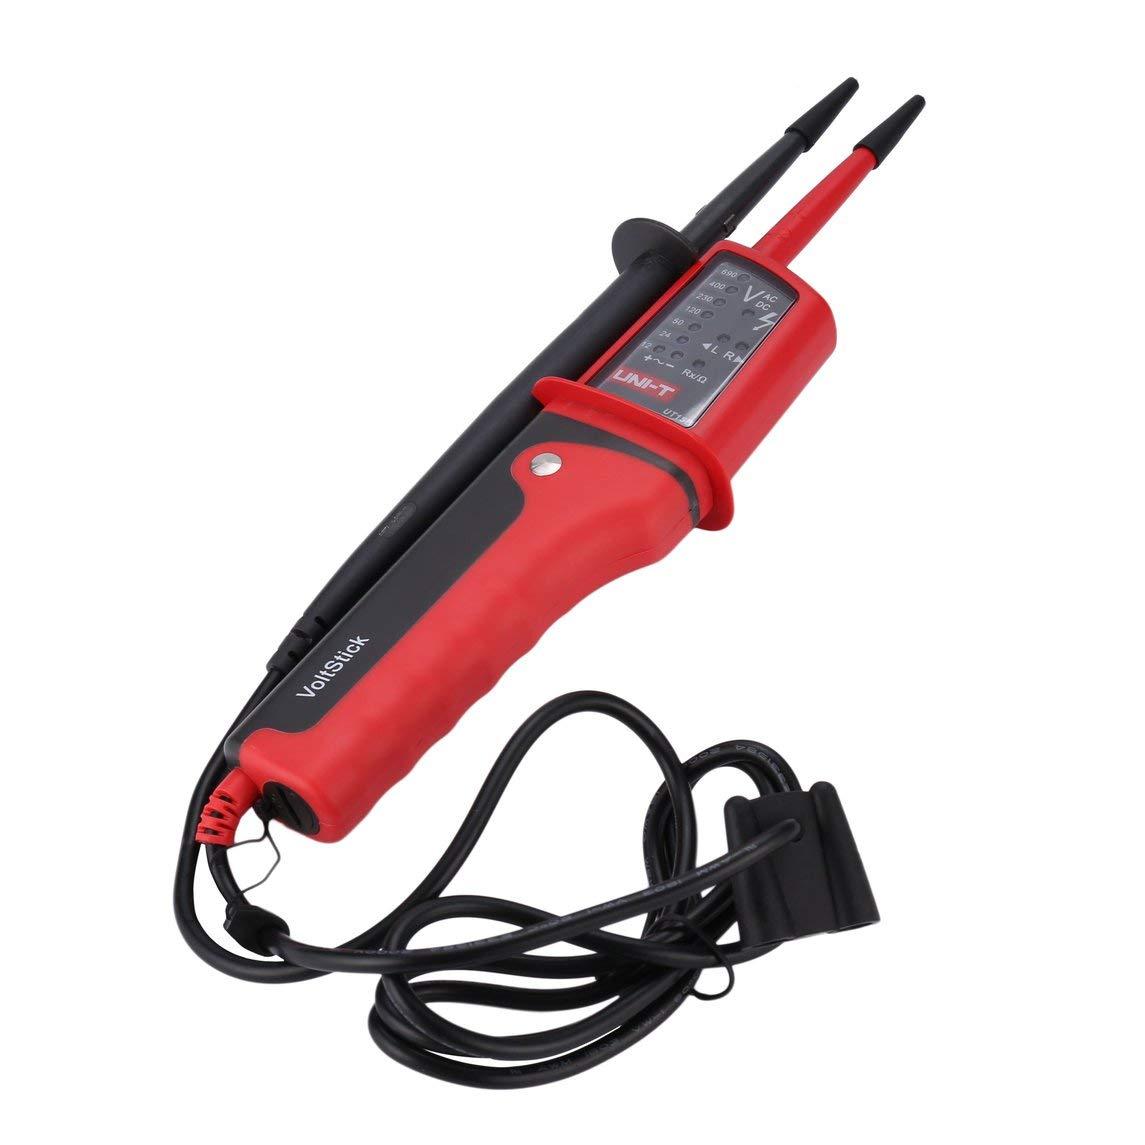 Footprintse UNI-T Digitale Elettrica AC DC Volt Tester Penna Mini Voltage Multimetro Palmare Impermeabile Multitester Tester Voltmetro-colore: rosso e grigio